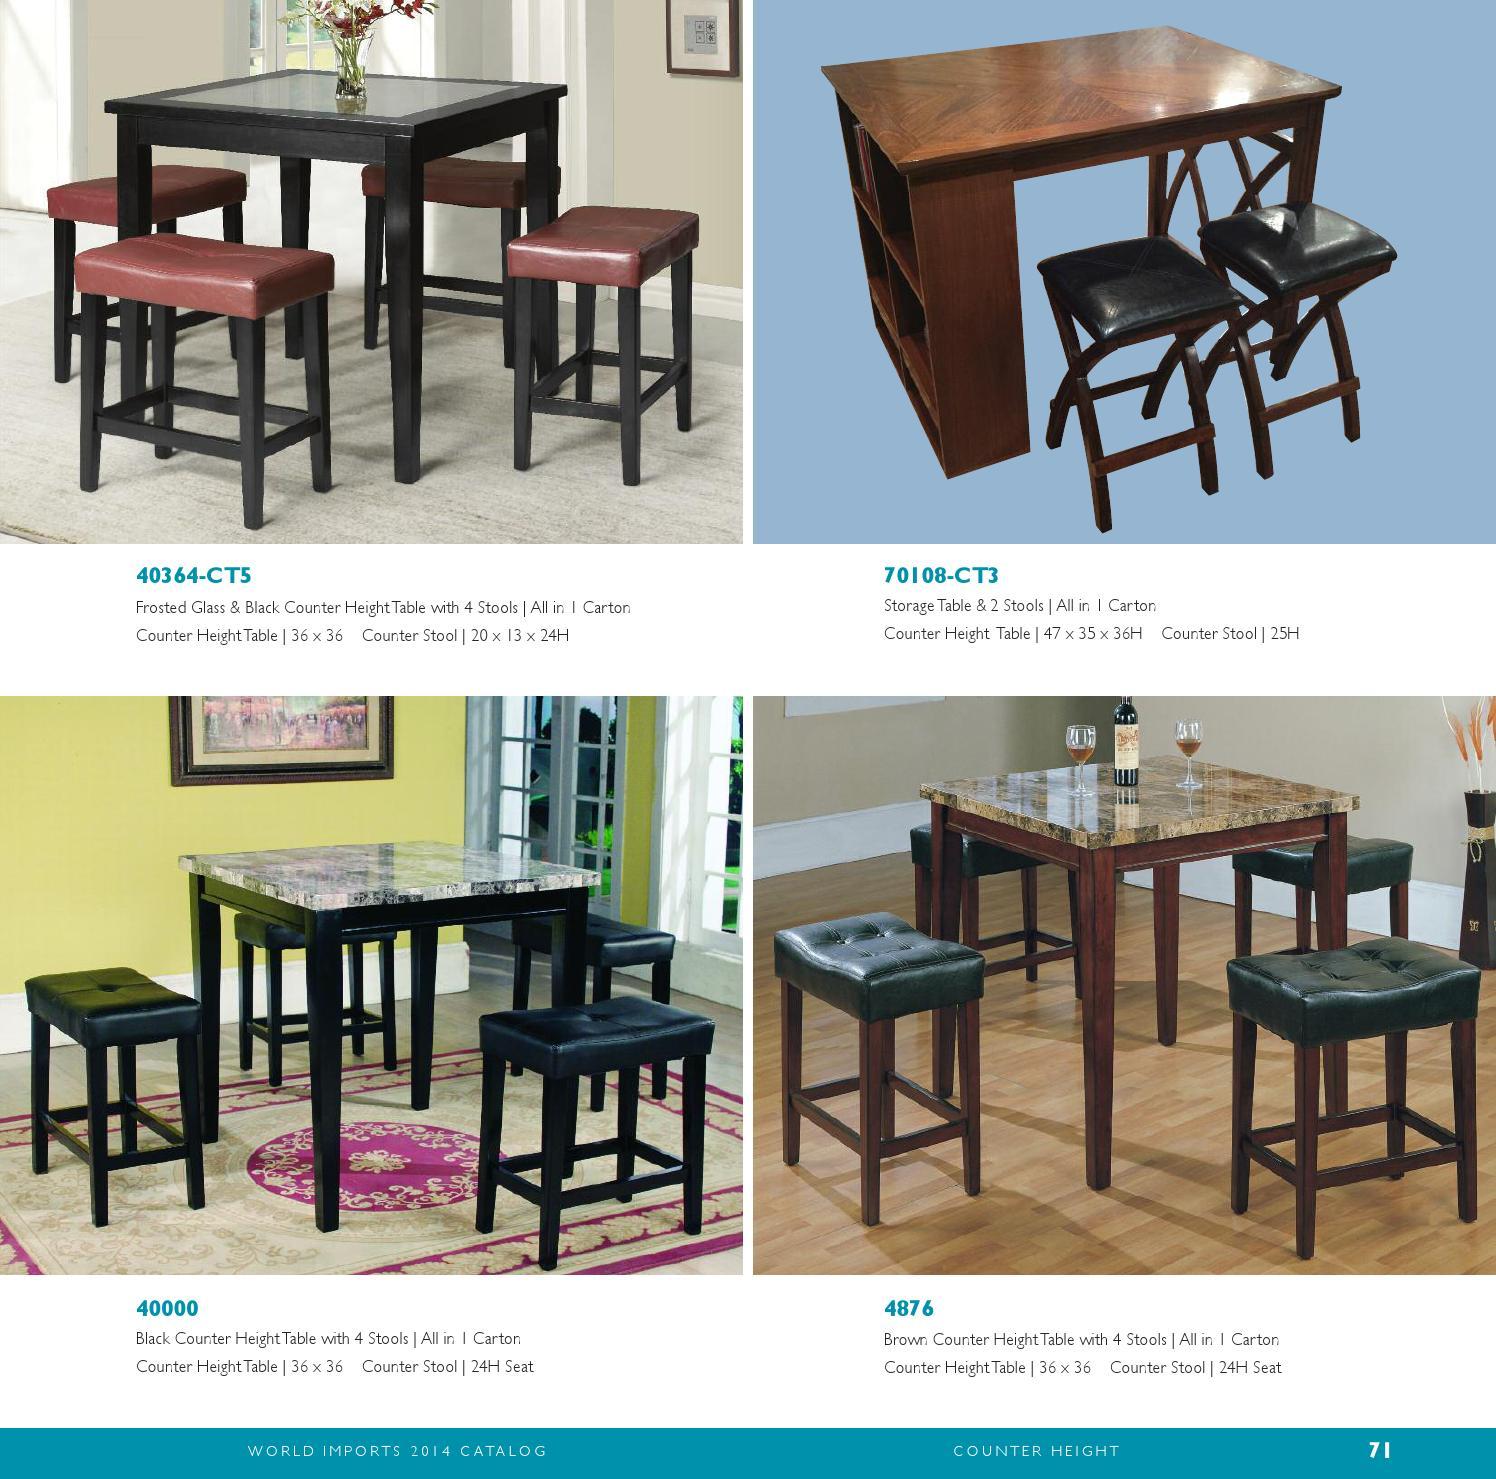 Pleasing World Imports 2014 Catalog By World Imports Ltd Issuu Beatyapartments Chair Design Images Beatyapartmentscom